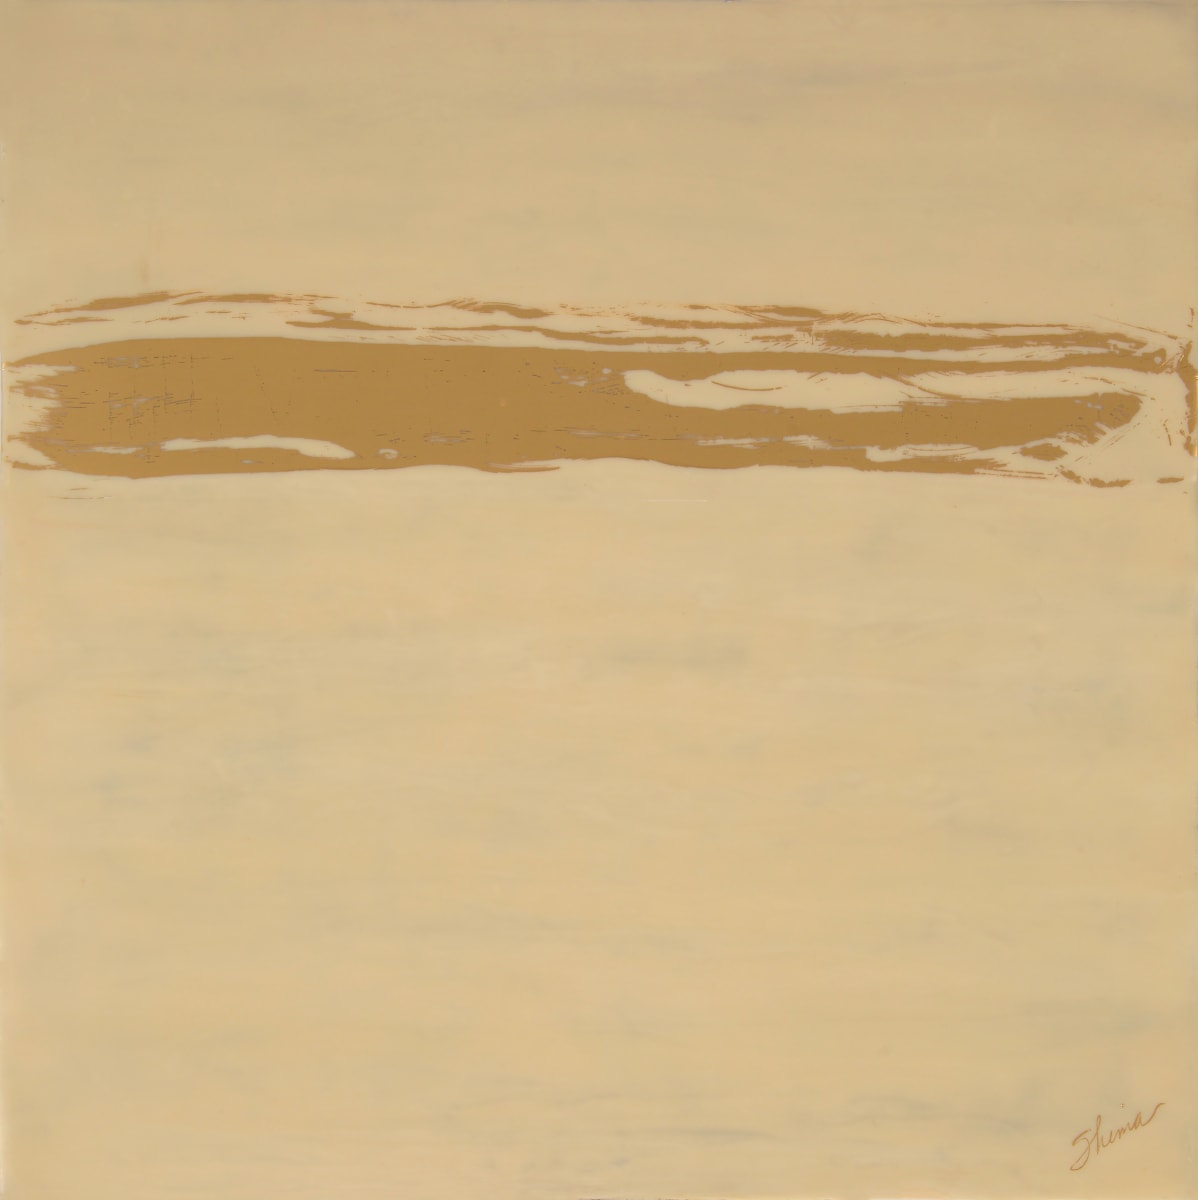 The Golden Barrier by Shima Shanti